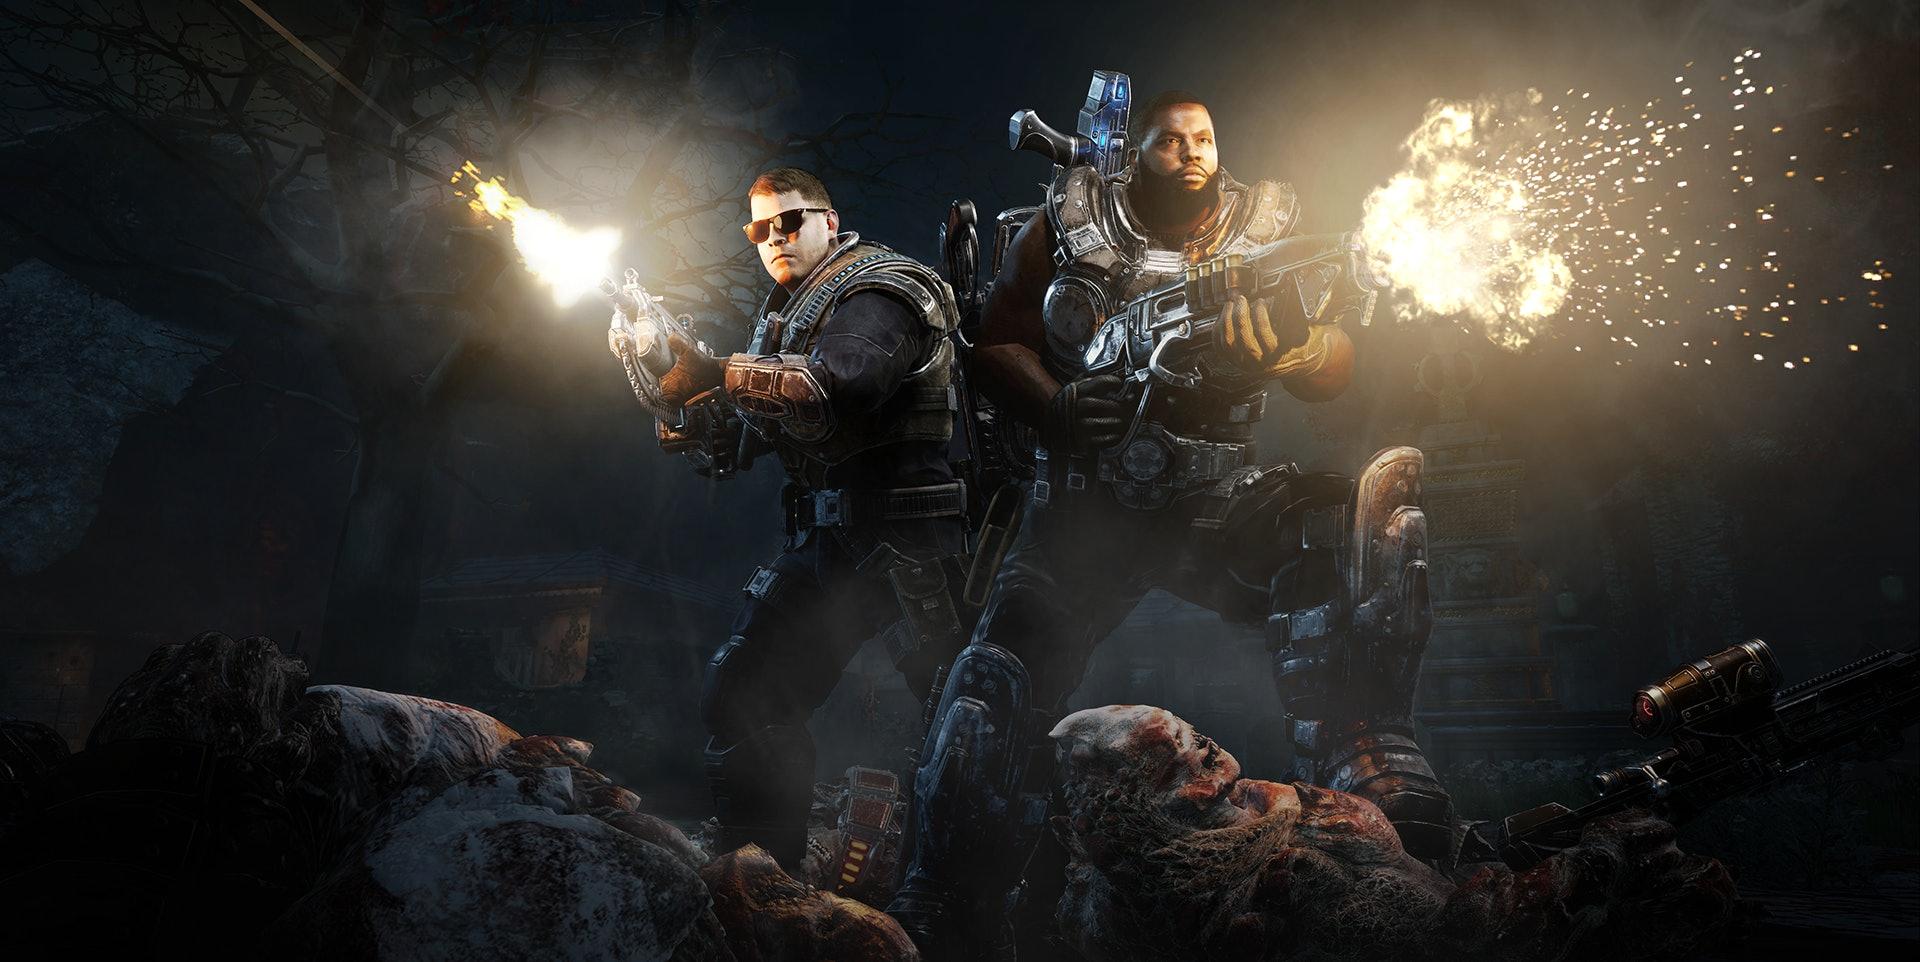 Gears of War 4 Run the Jewels